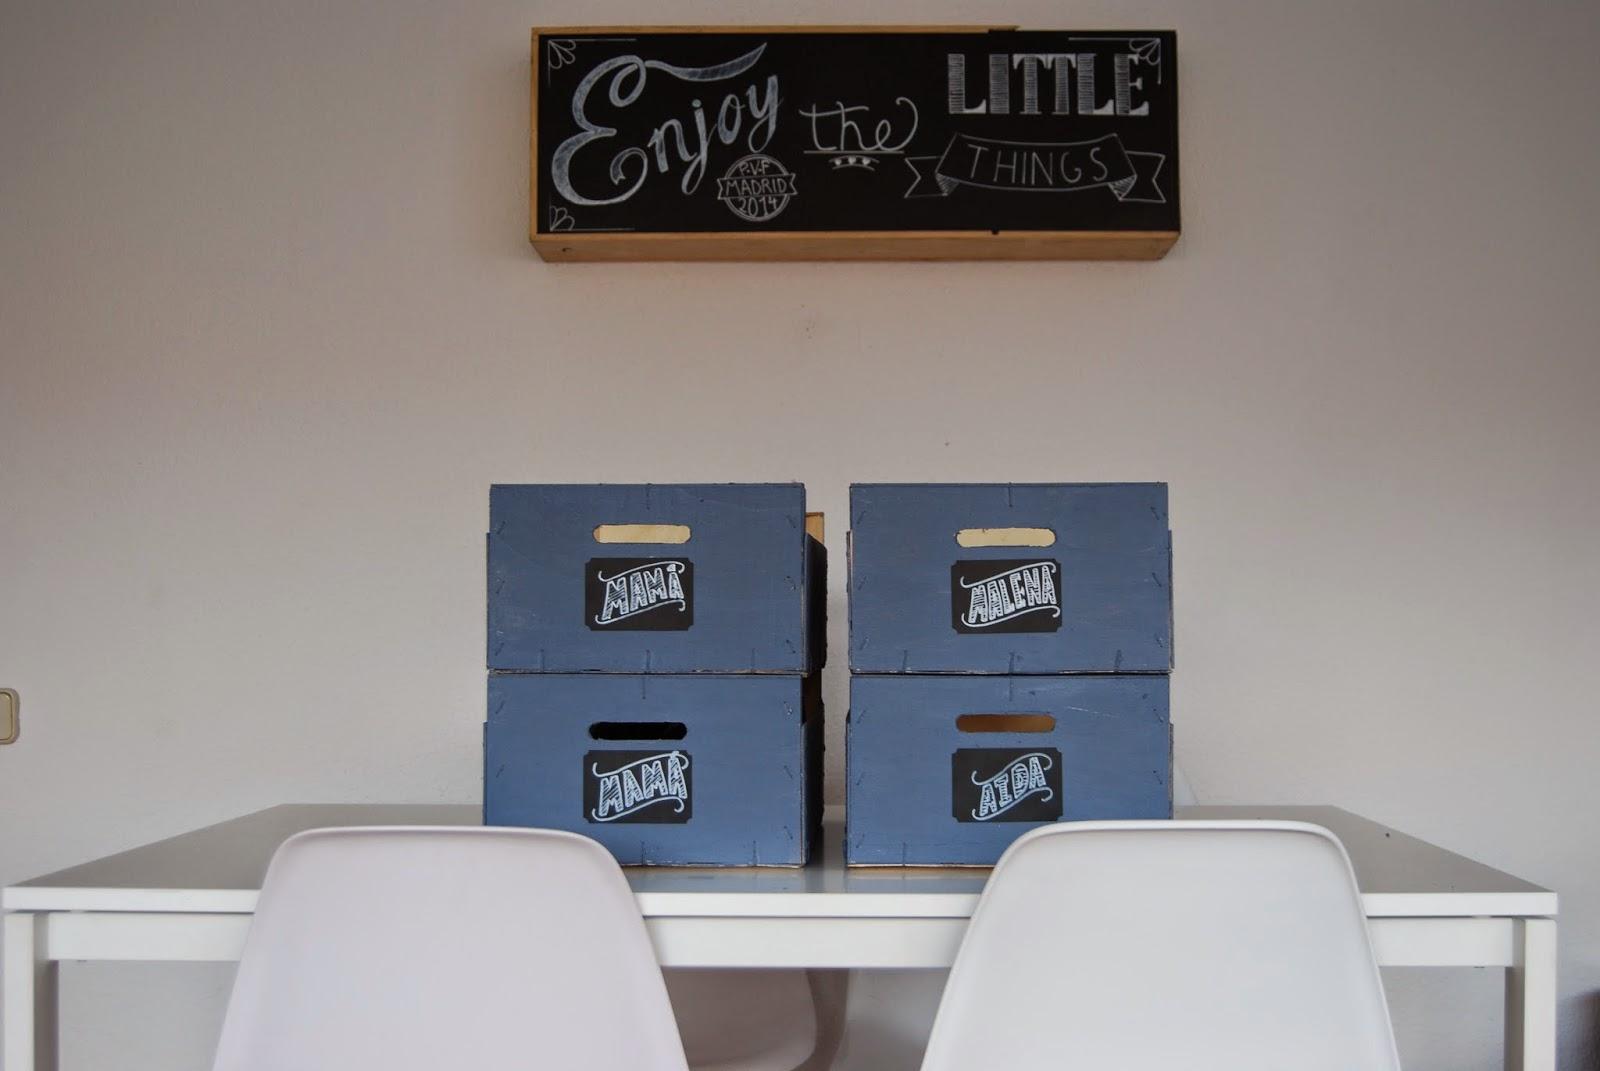 http://sosunnyblog.blogspot.com.es/2014/10/cajas-de-fruta-que-sirven-para-casi-todo.html